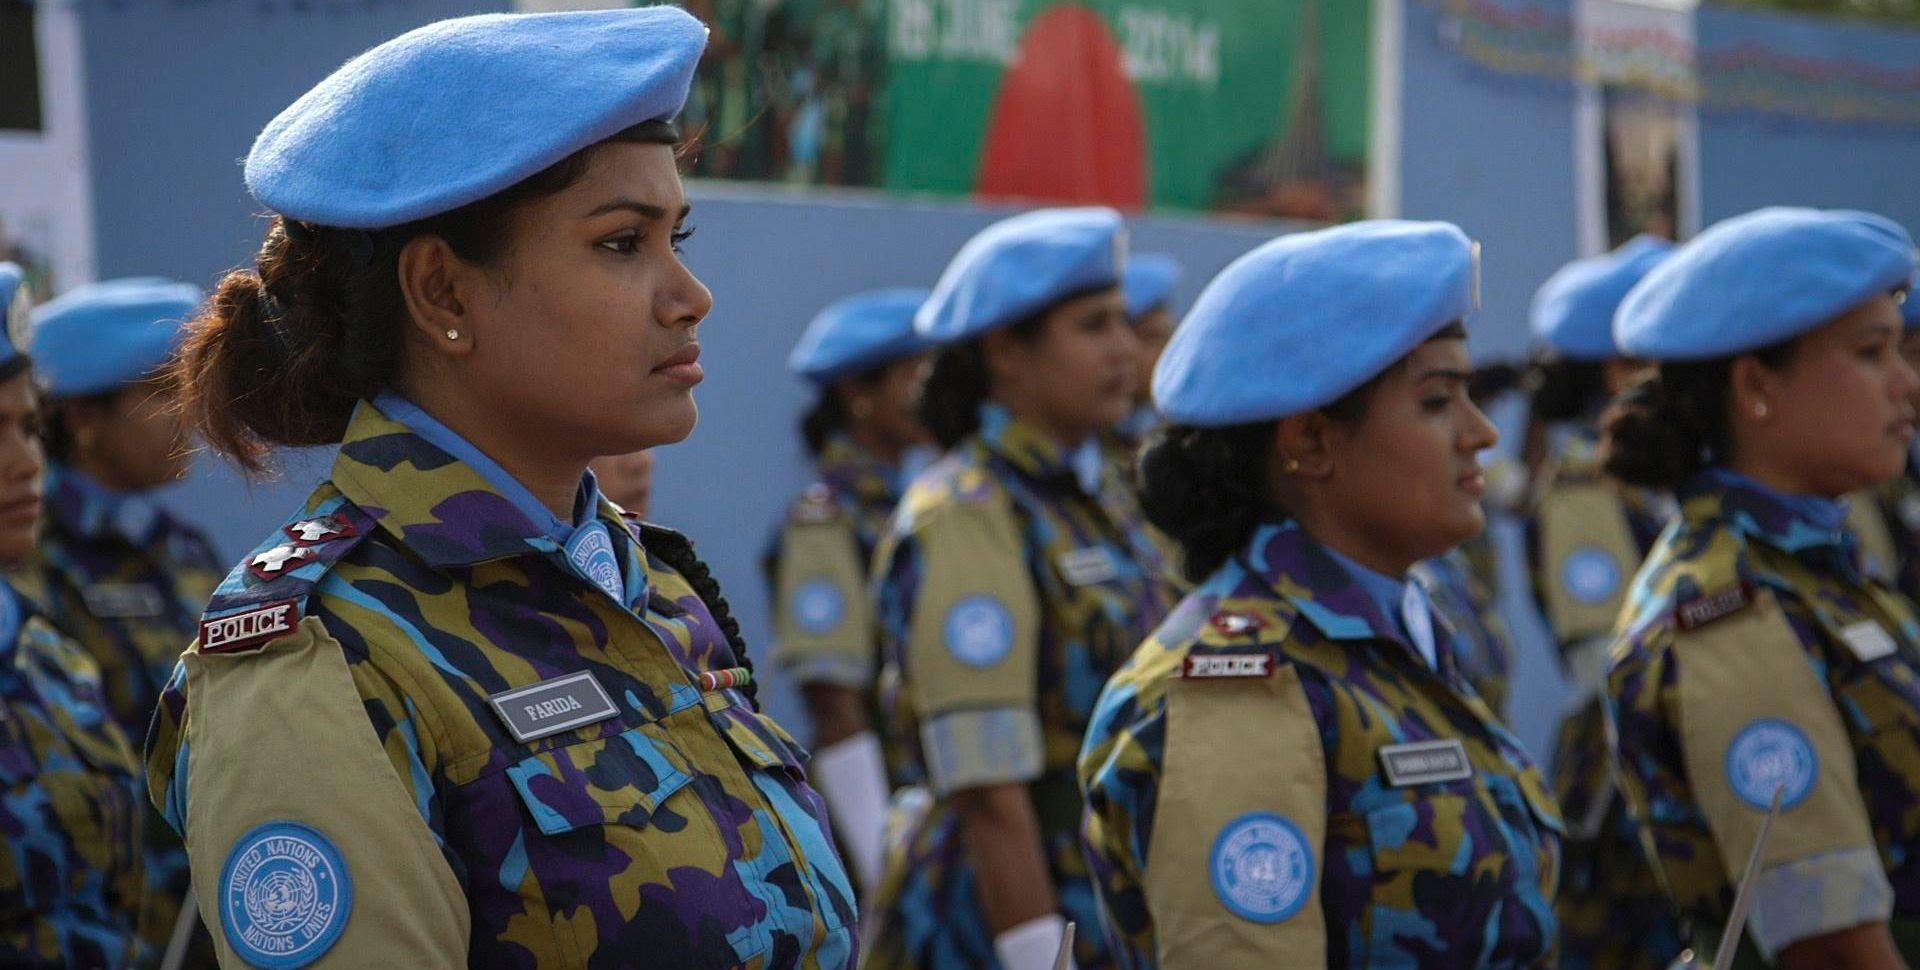 Women peacekeepers in uniform